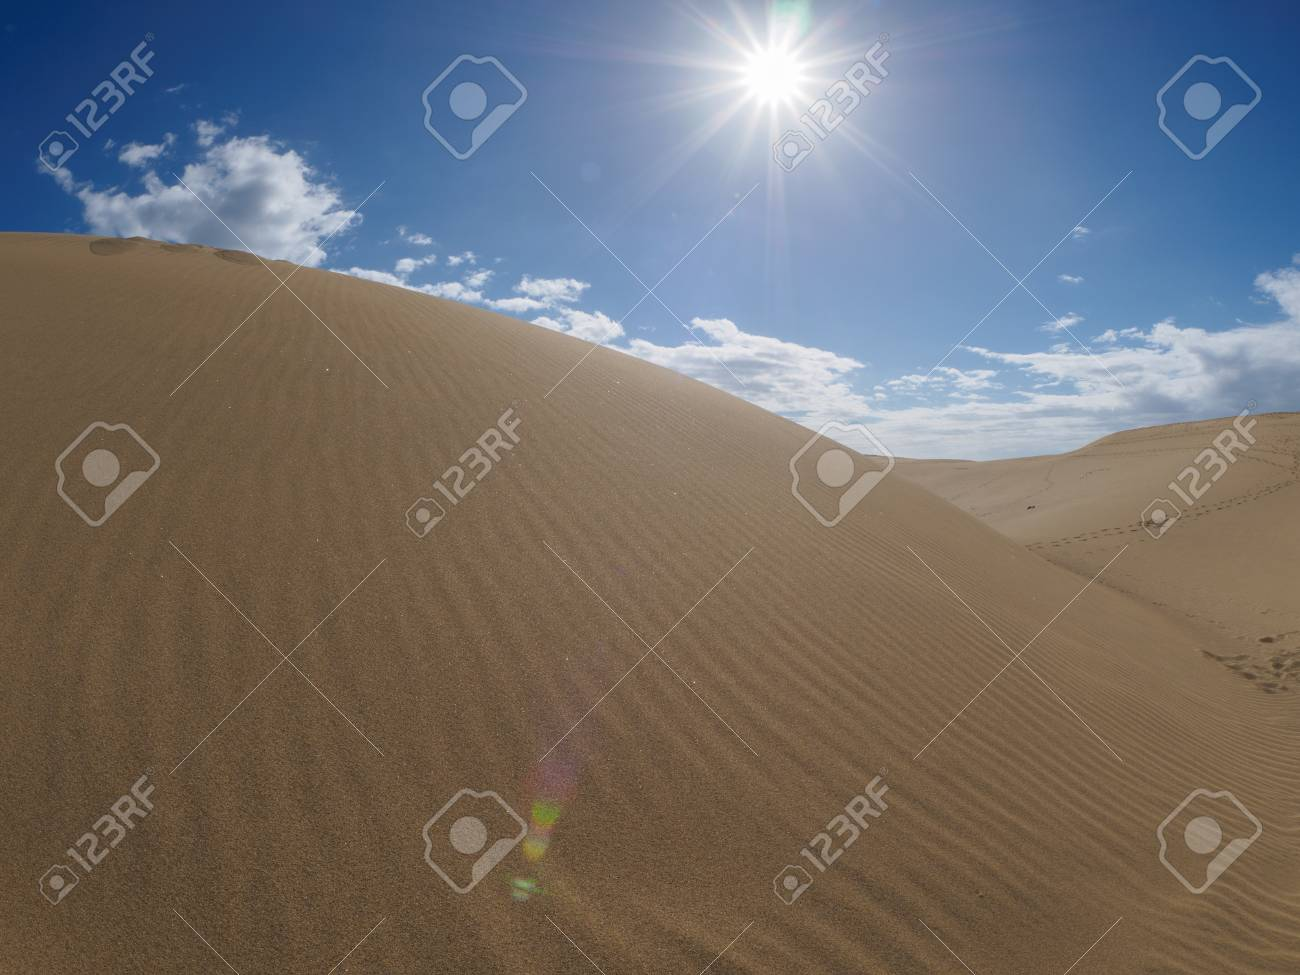 Dunes of Maspalomas Standard-Bild - 89546846